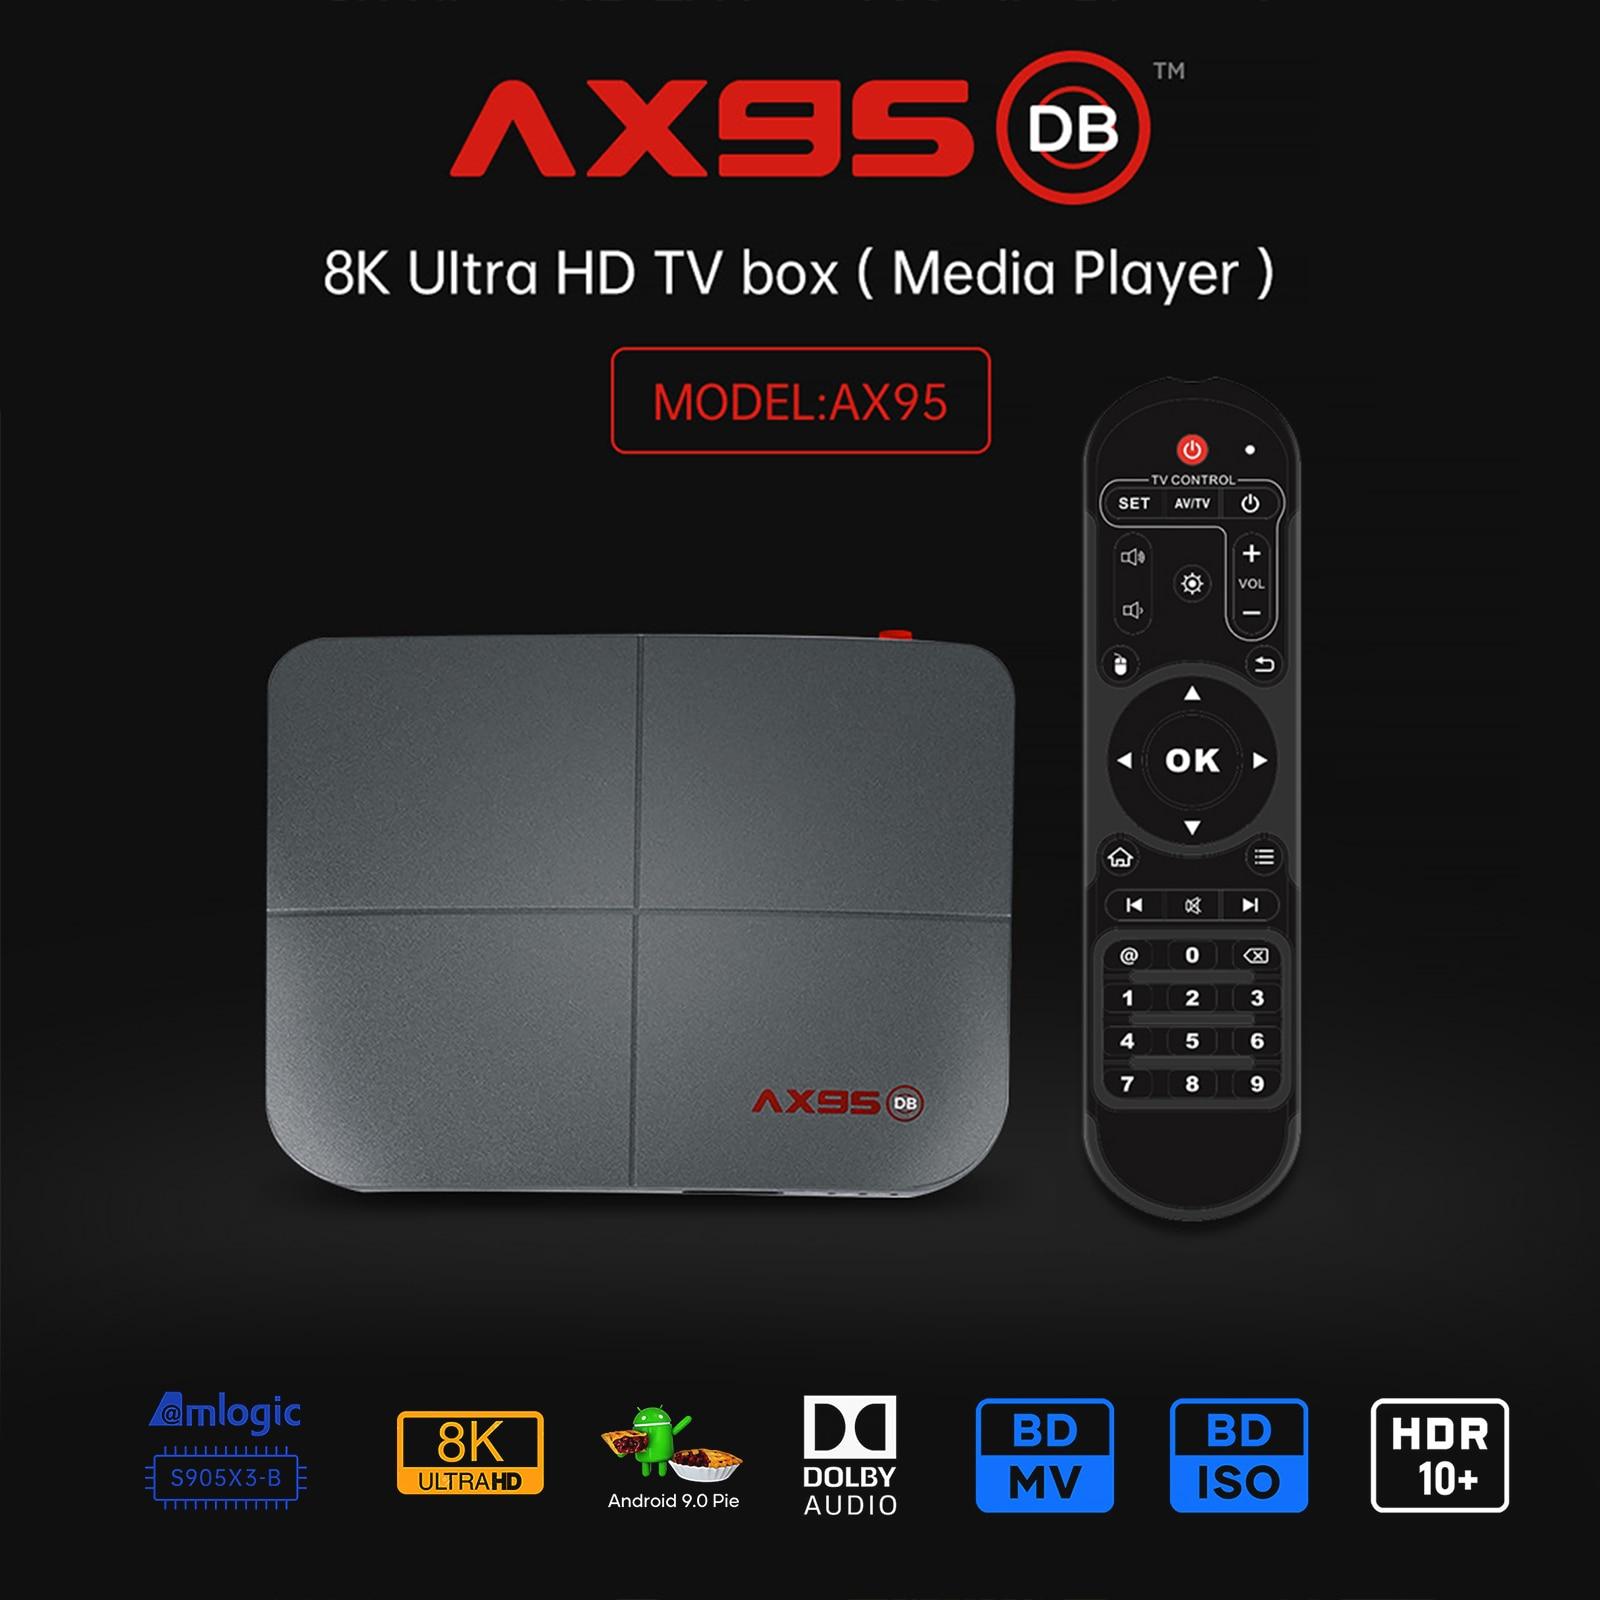 Ax95 db amlogic S905X3 B smart android 9.0 caixa de tv 4gb ram 32gb 64gb 128gb rom 4k hd conjunto caixa superior suporte dolby blu ray bd mv iso|Conversor de TV|   -